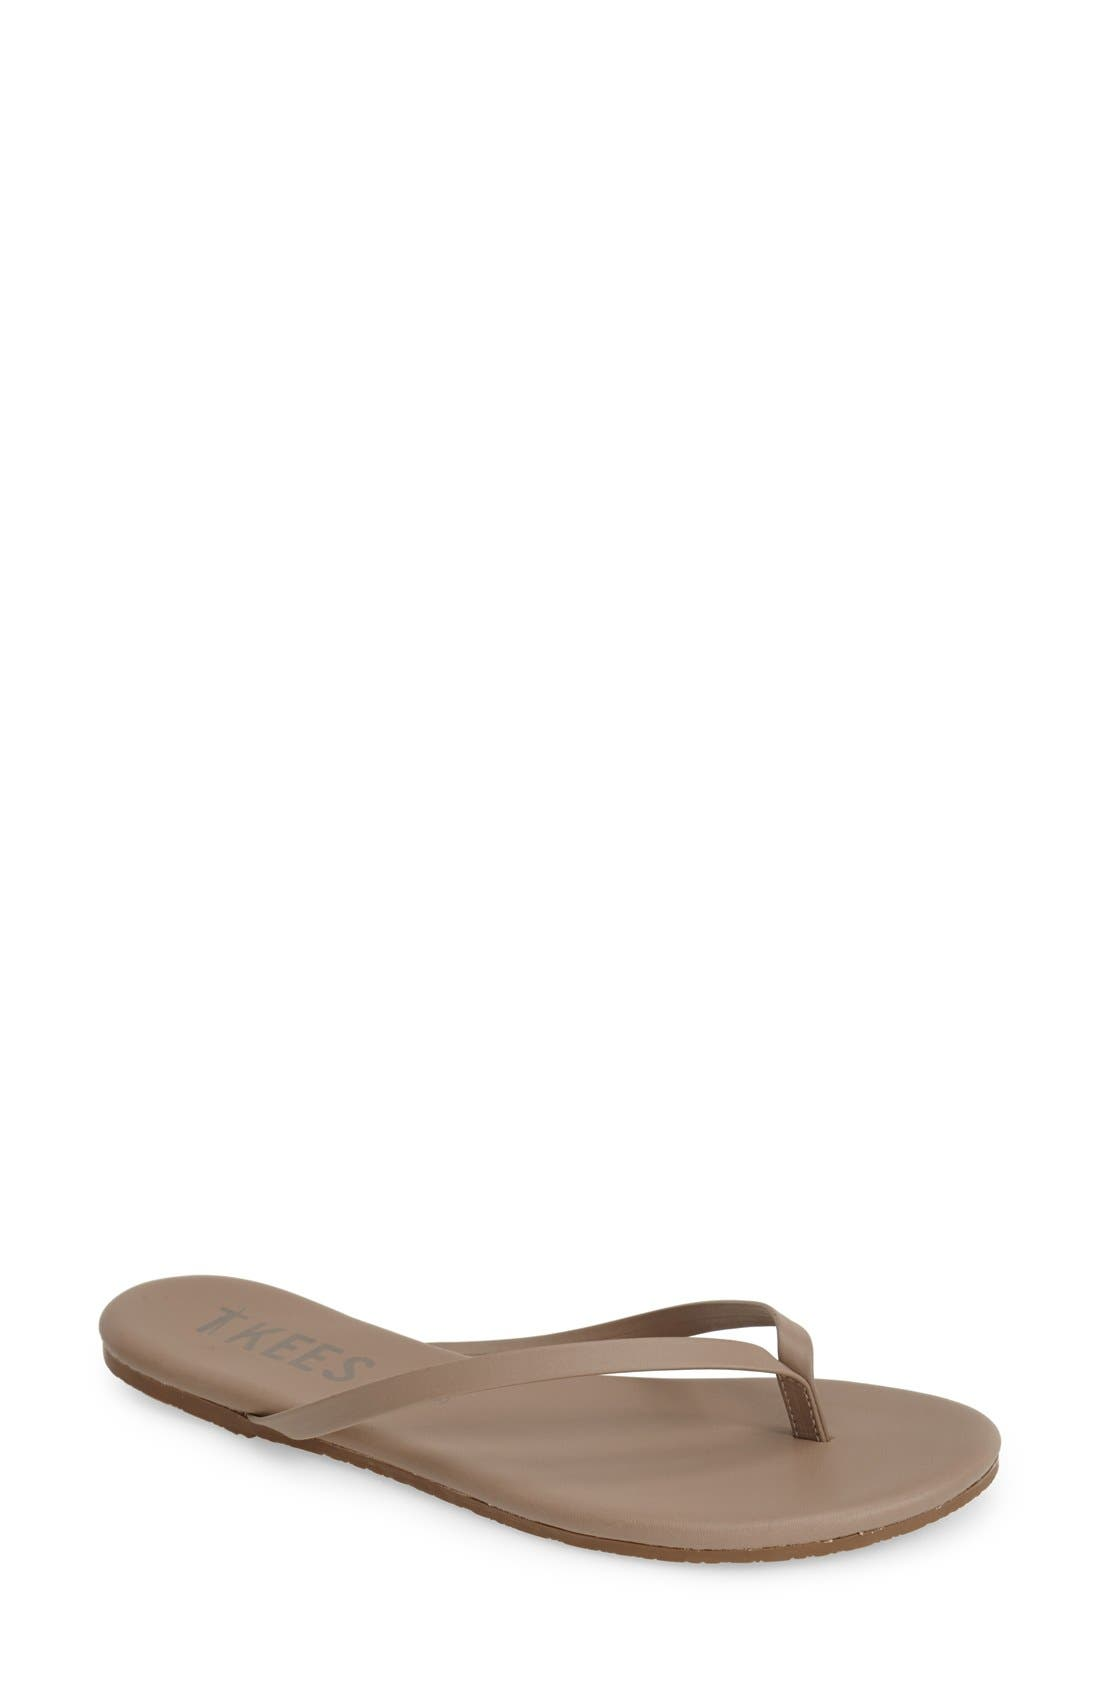 'Liners' Flip Flop,                         Main,                         color, BISCUIT